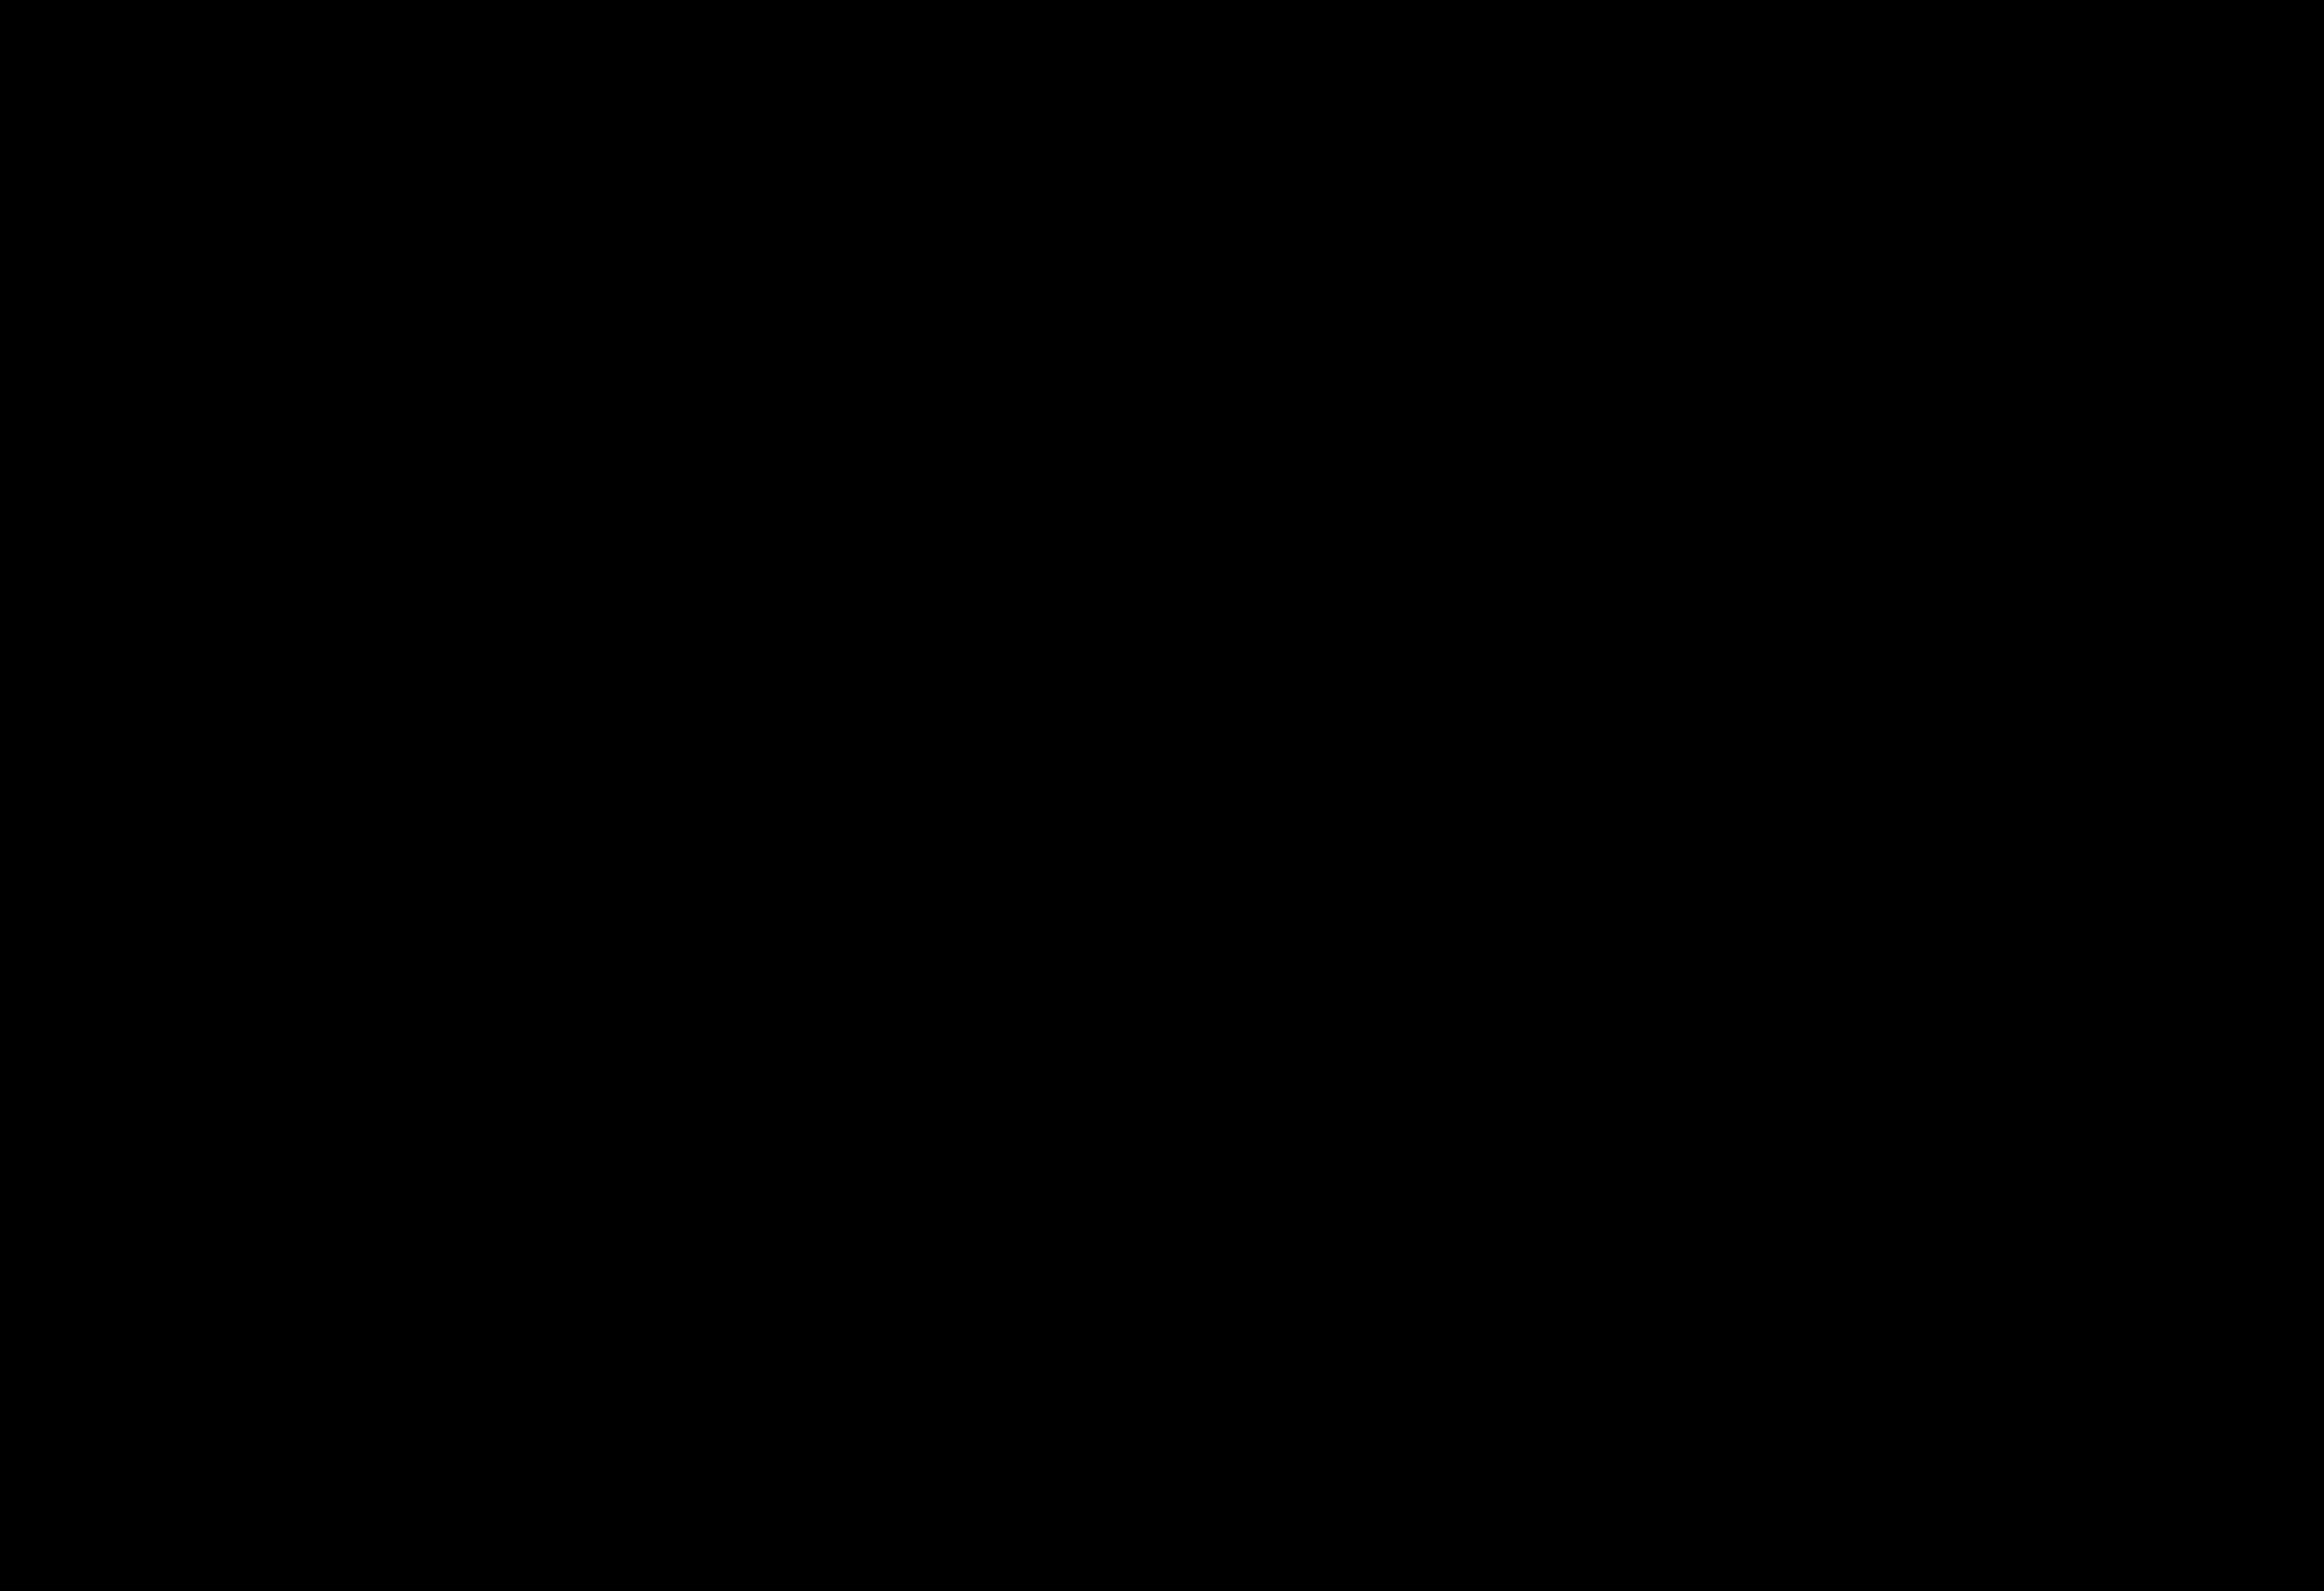 chevy logo transparent background chevy ss symbol german